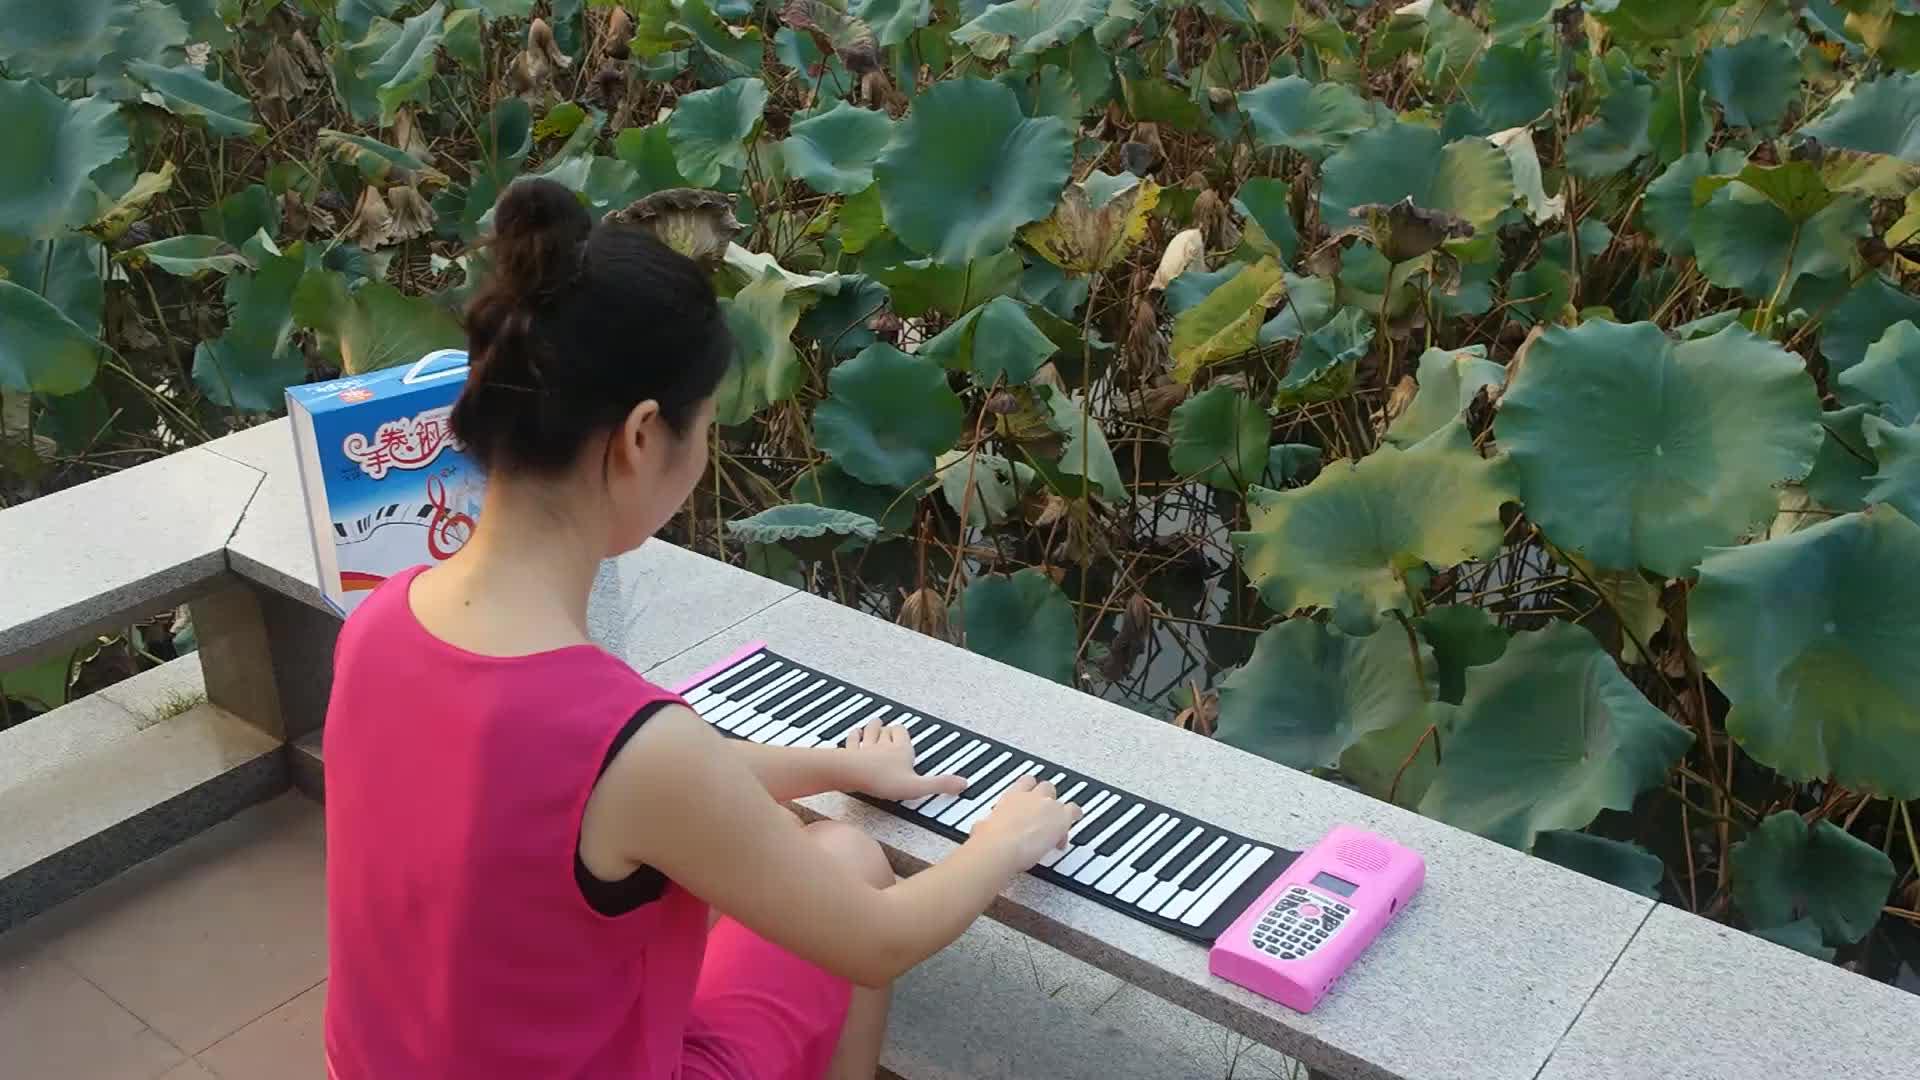 Bora groothandel muziek instrument 49 toetsen piano elektrische opvouwbare piano toetsenbord